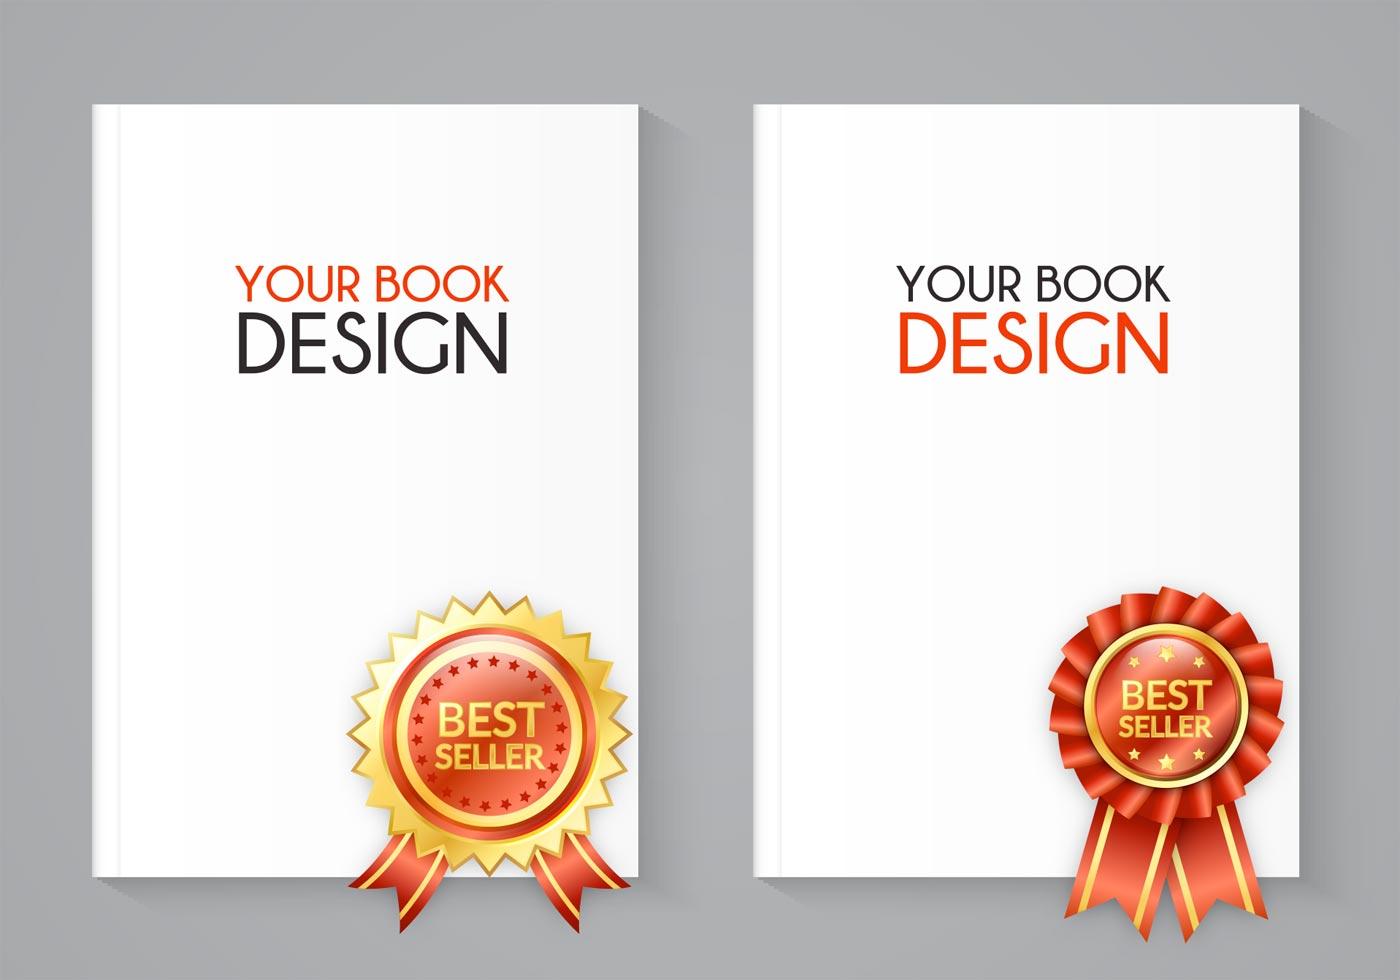 Best Book Cover Vector : Free best seller book vector set download